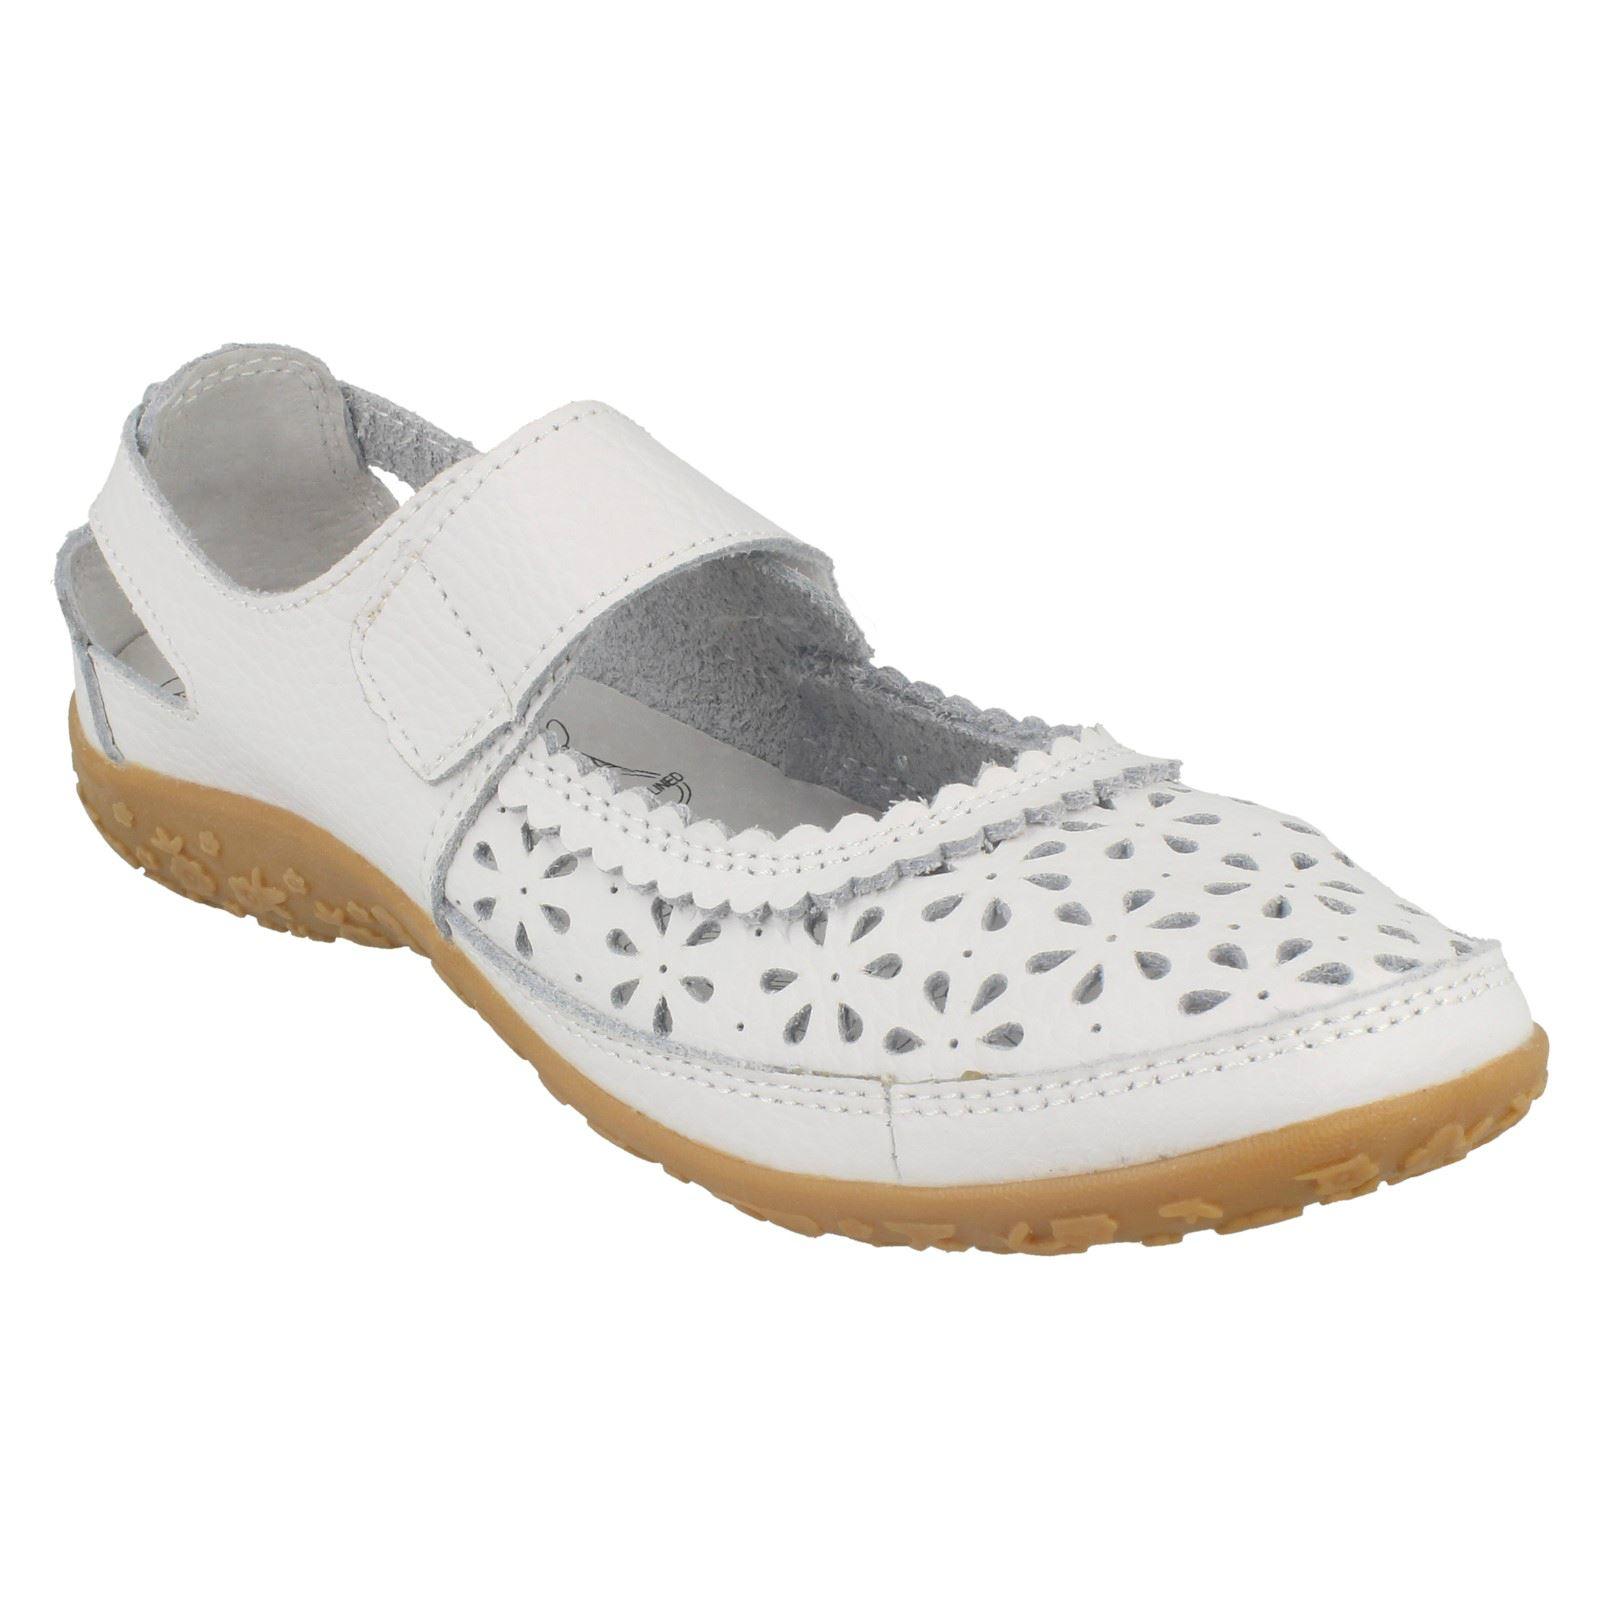 lifestyle by cushion walk burnley casual shoes ebay